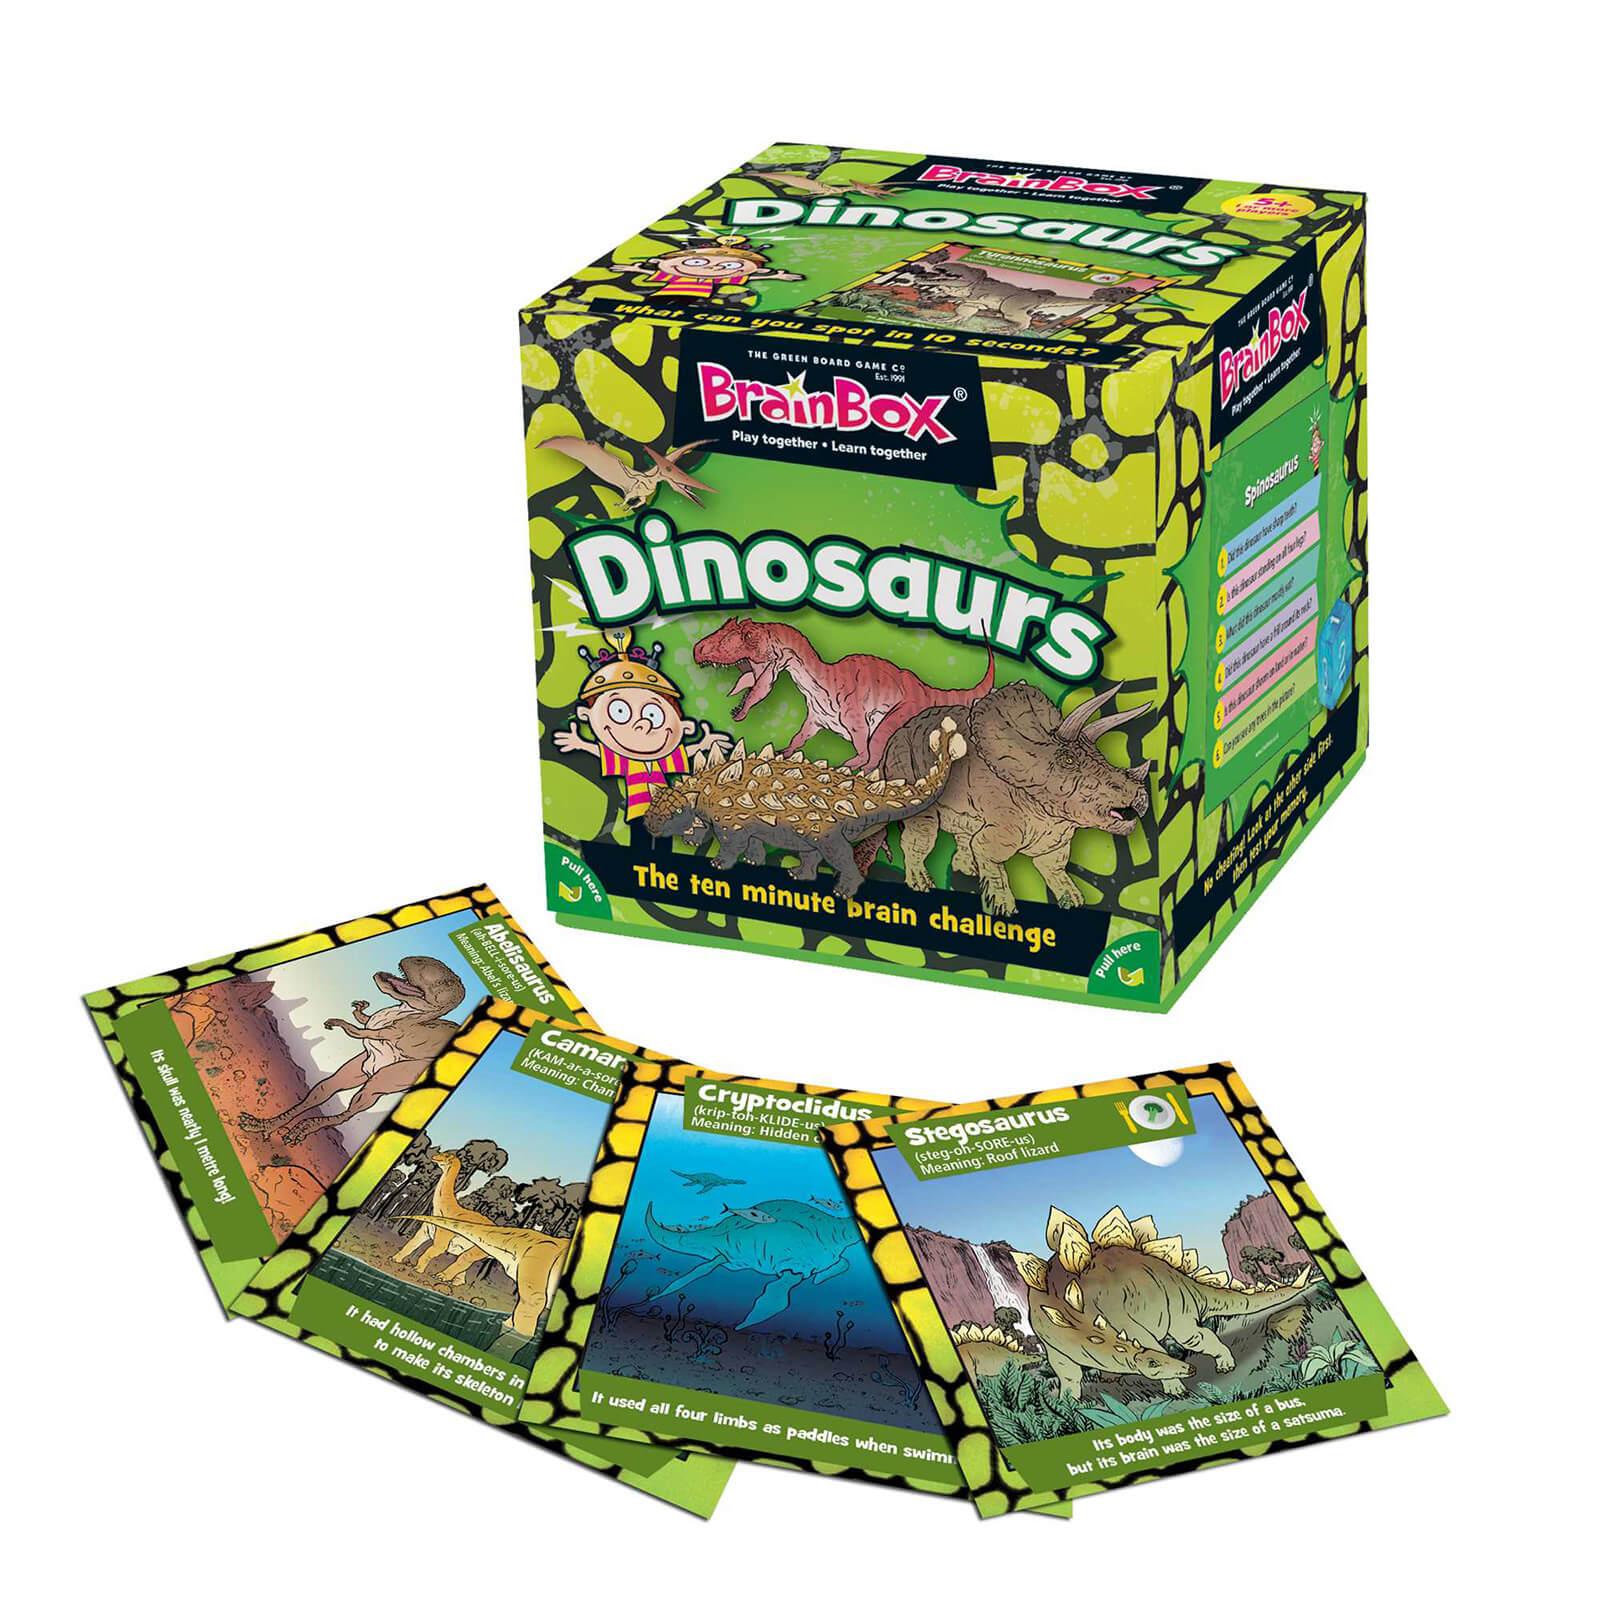 BrainBox Card Game - Dinosaurs Edition (55 cards)